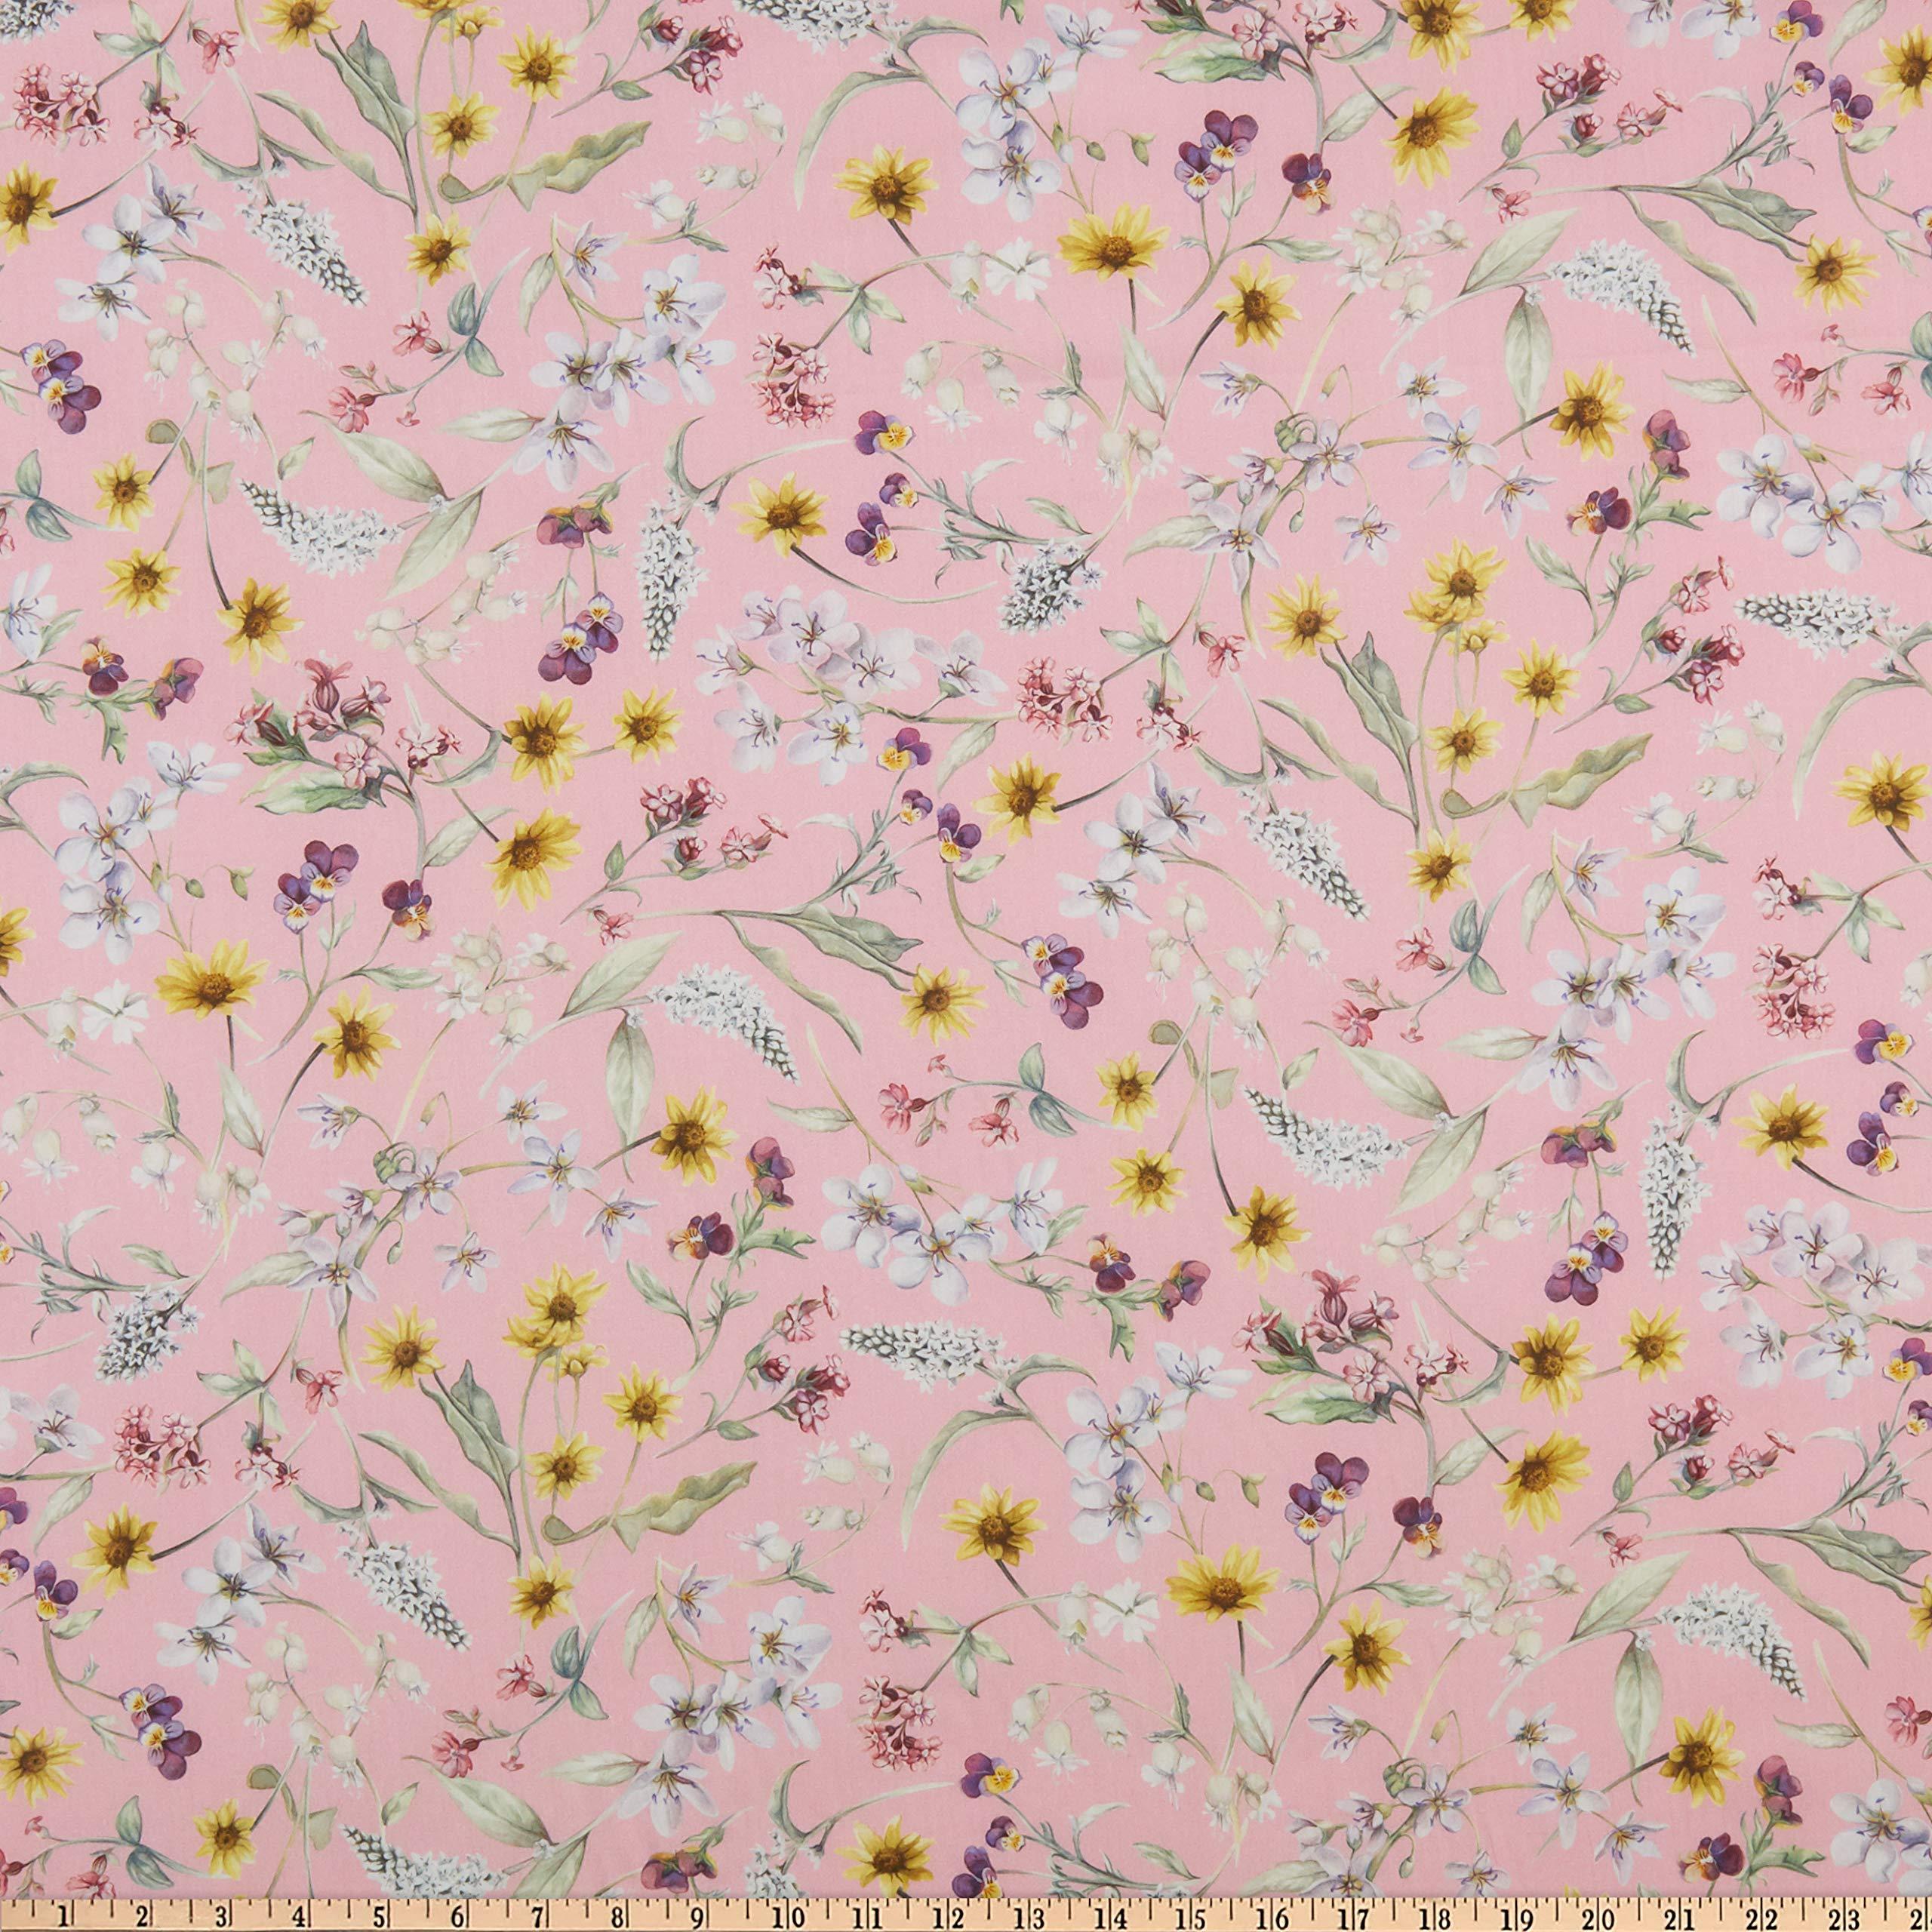 Liberty Fabrics Tana Lawn Primavera Pink/Multi